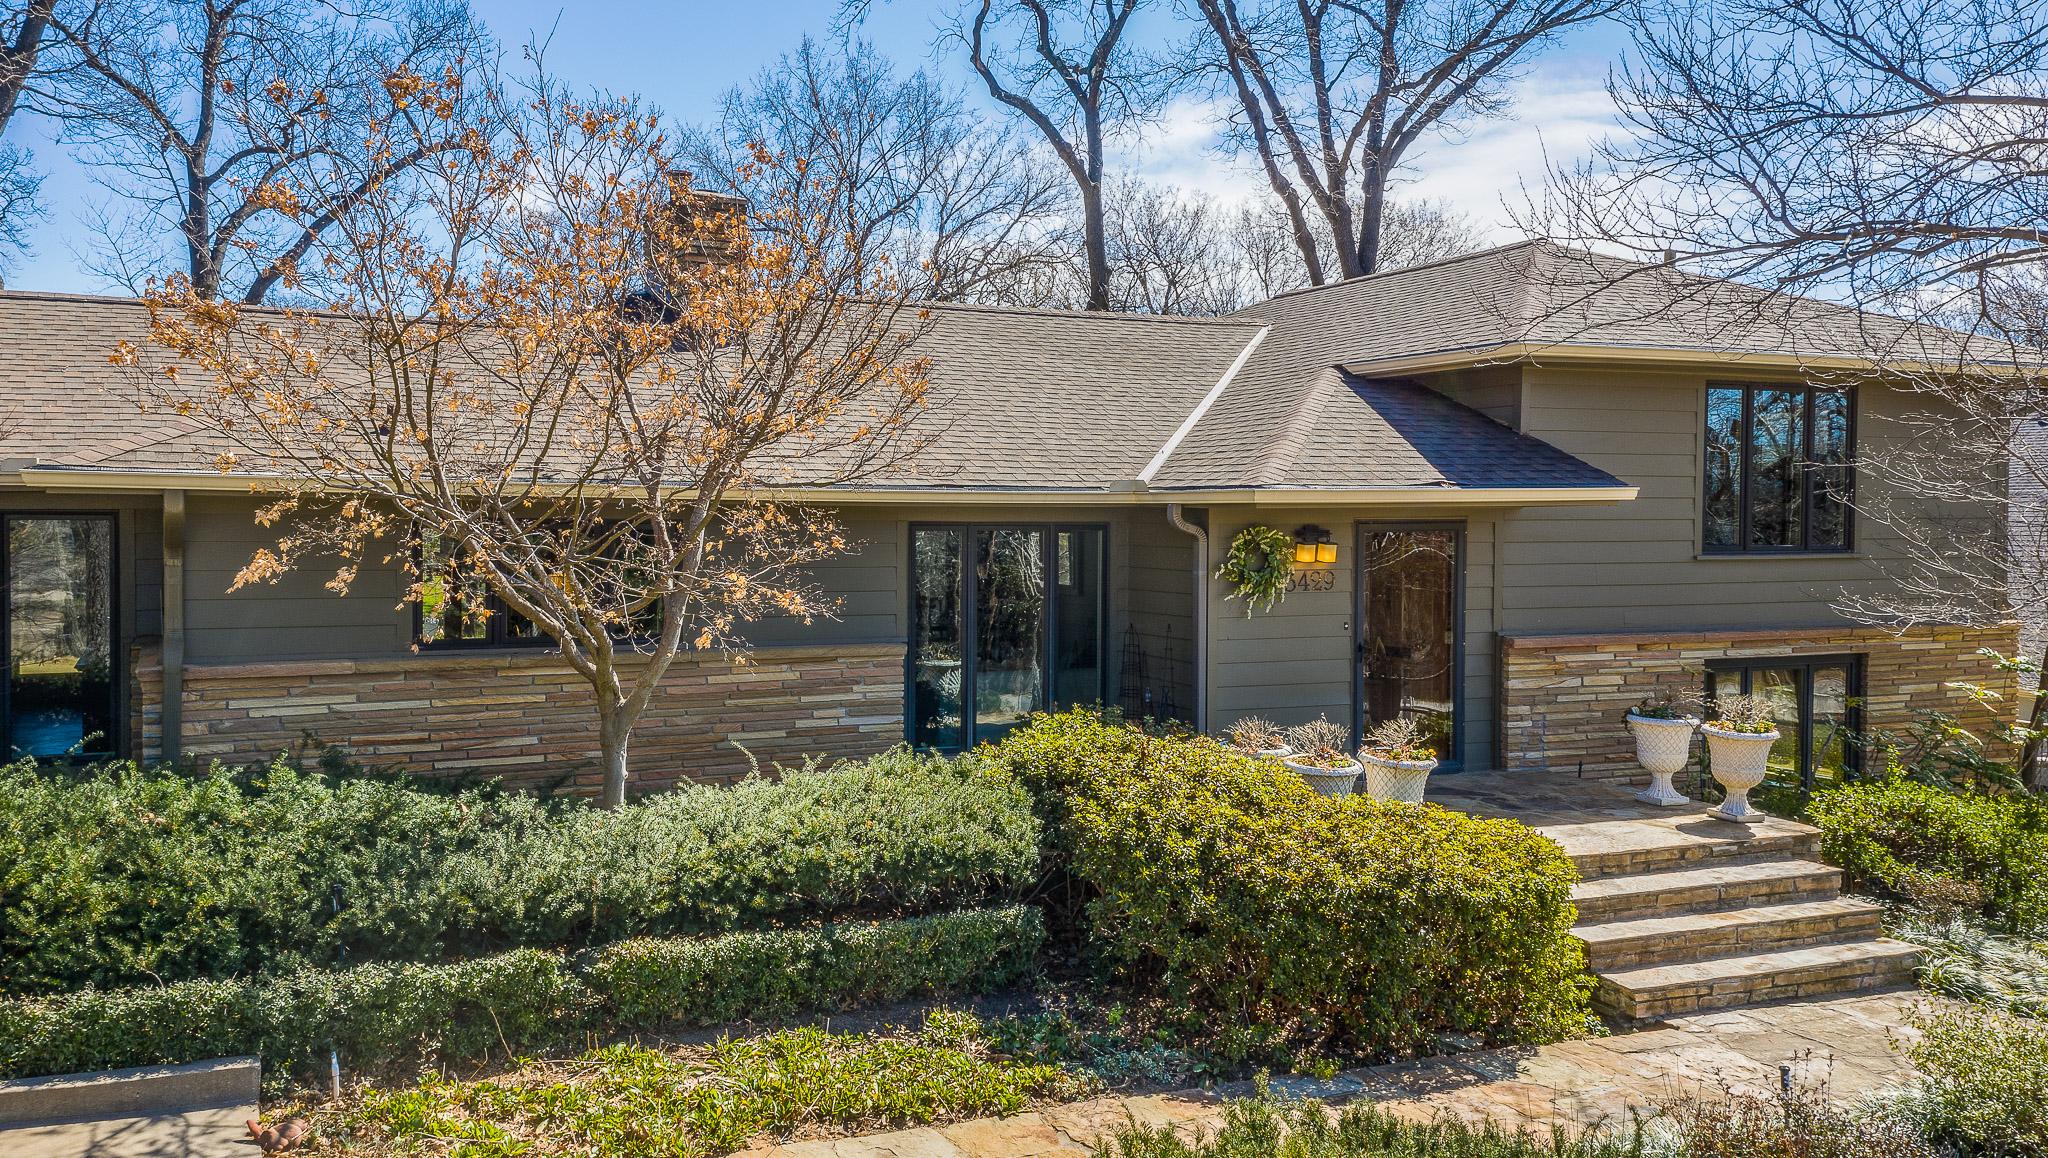 3429 S Lewis - Tulsa - $899,000